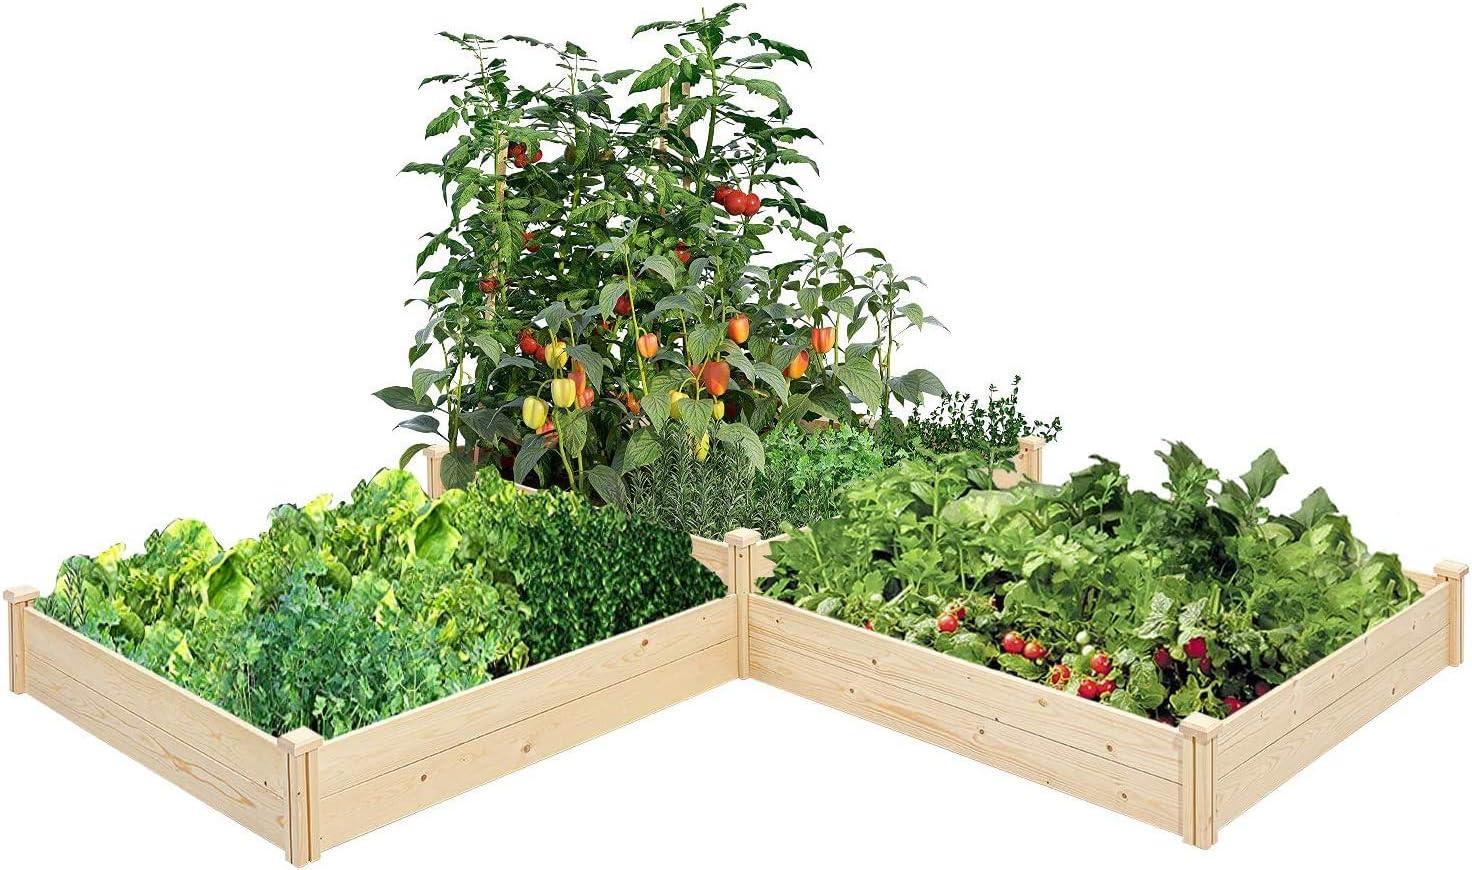 SOLAURA Wooden Raised 信用 Planter 《週末限定タイムセール》 Box Wood Outdoor Kit Solid